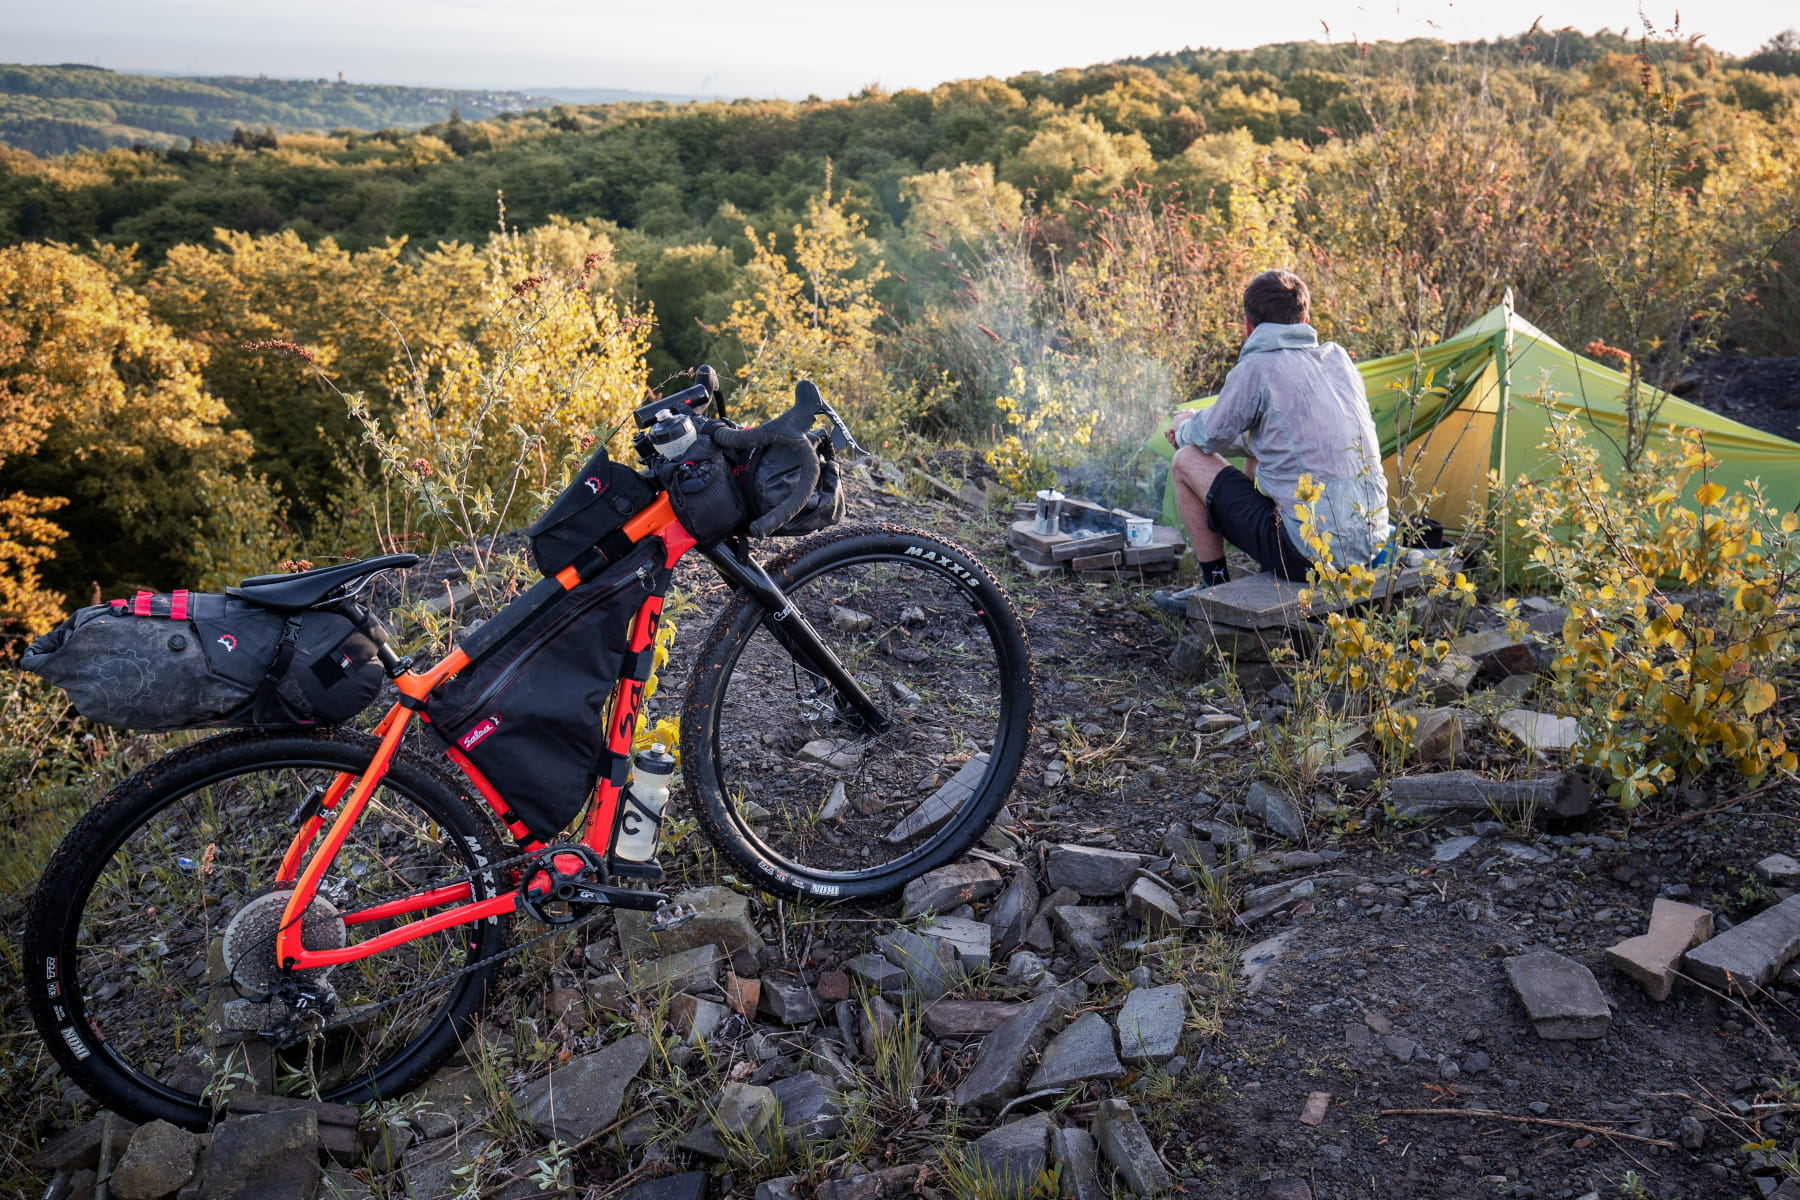 bikepacking-ausruestung-1